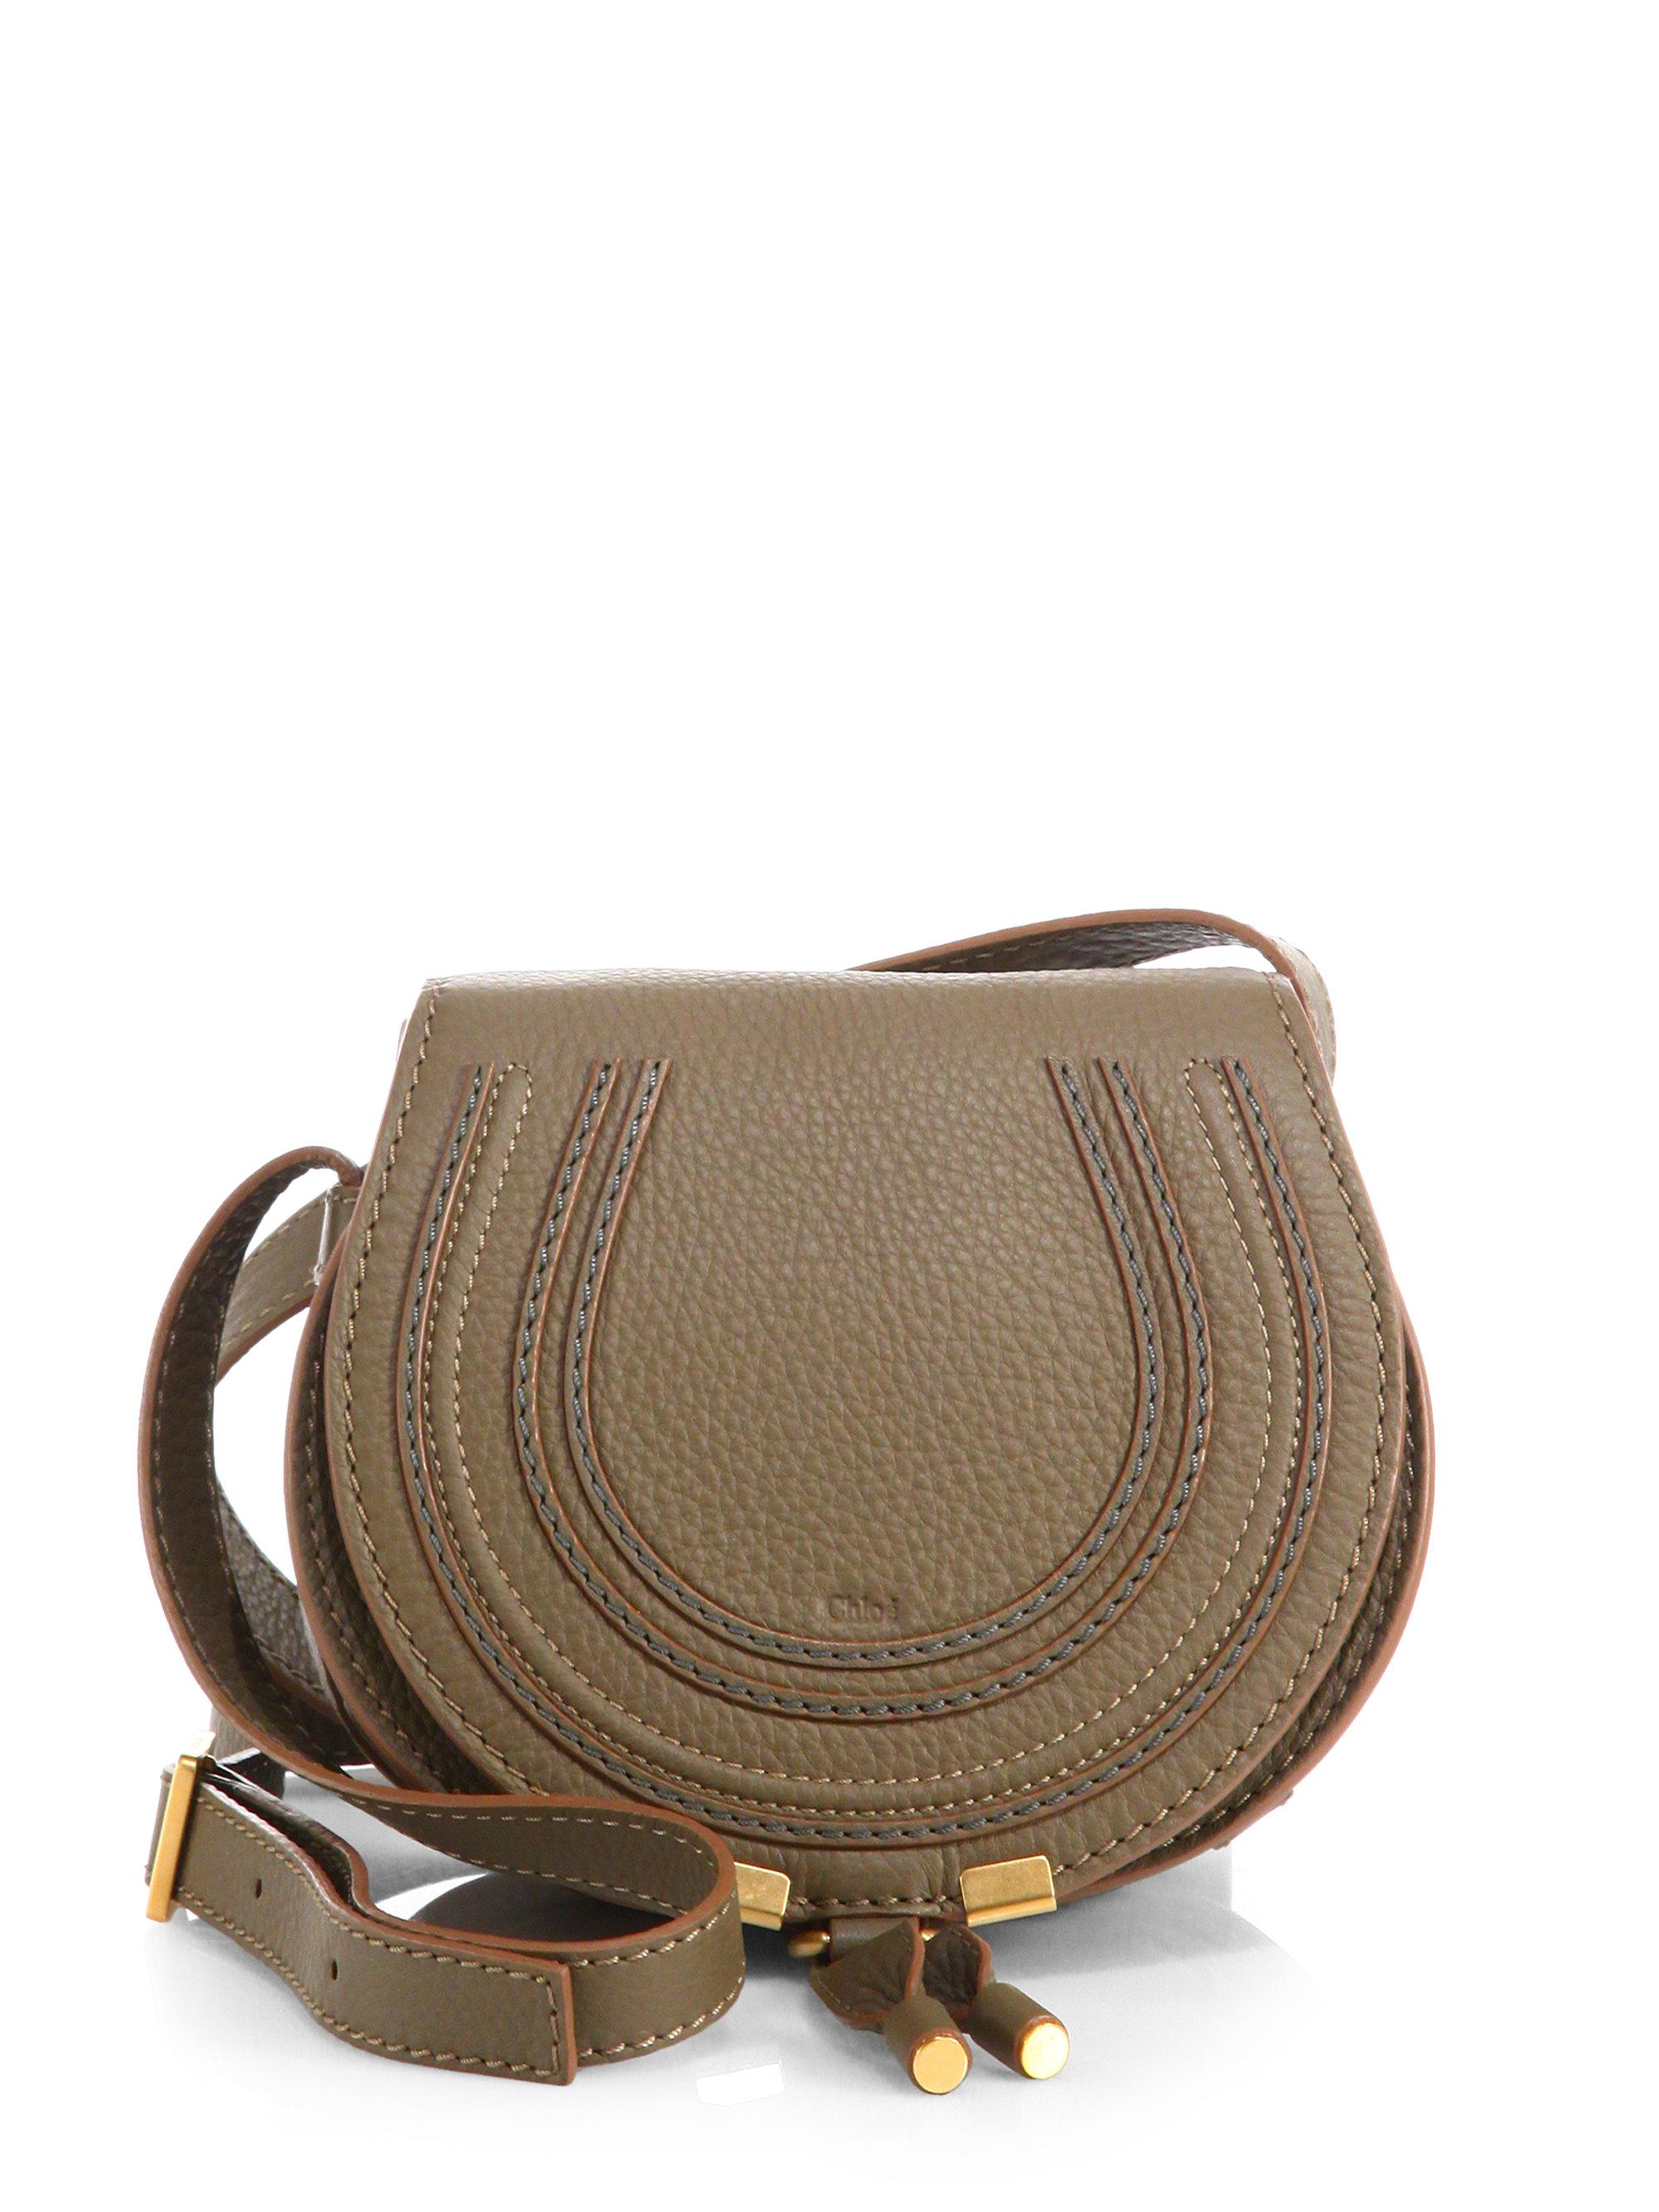 handbags see by chloe - chloe small marcie saddle crossbody, replica chloe bag